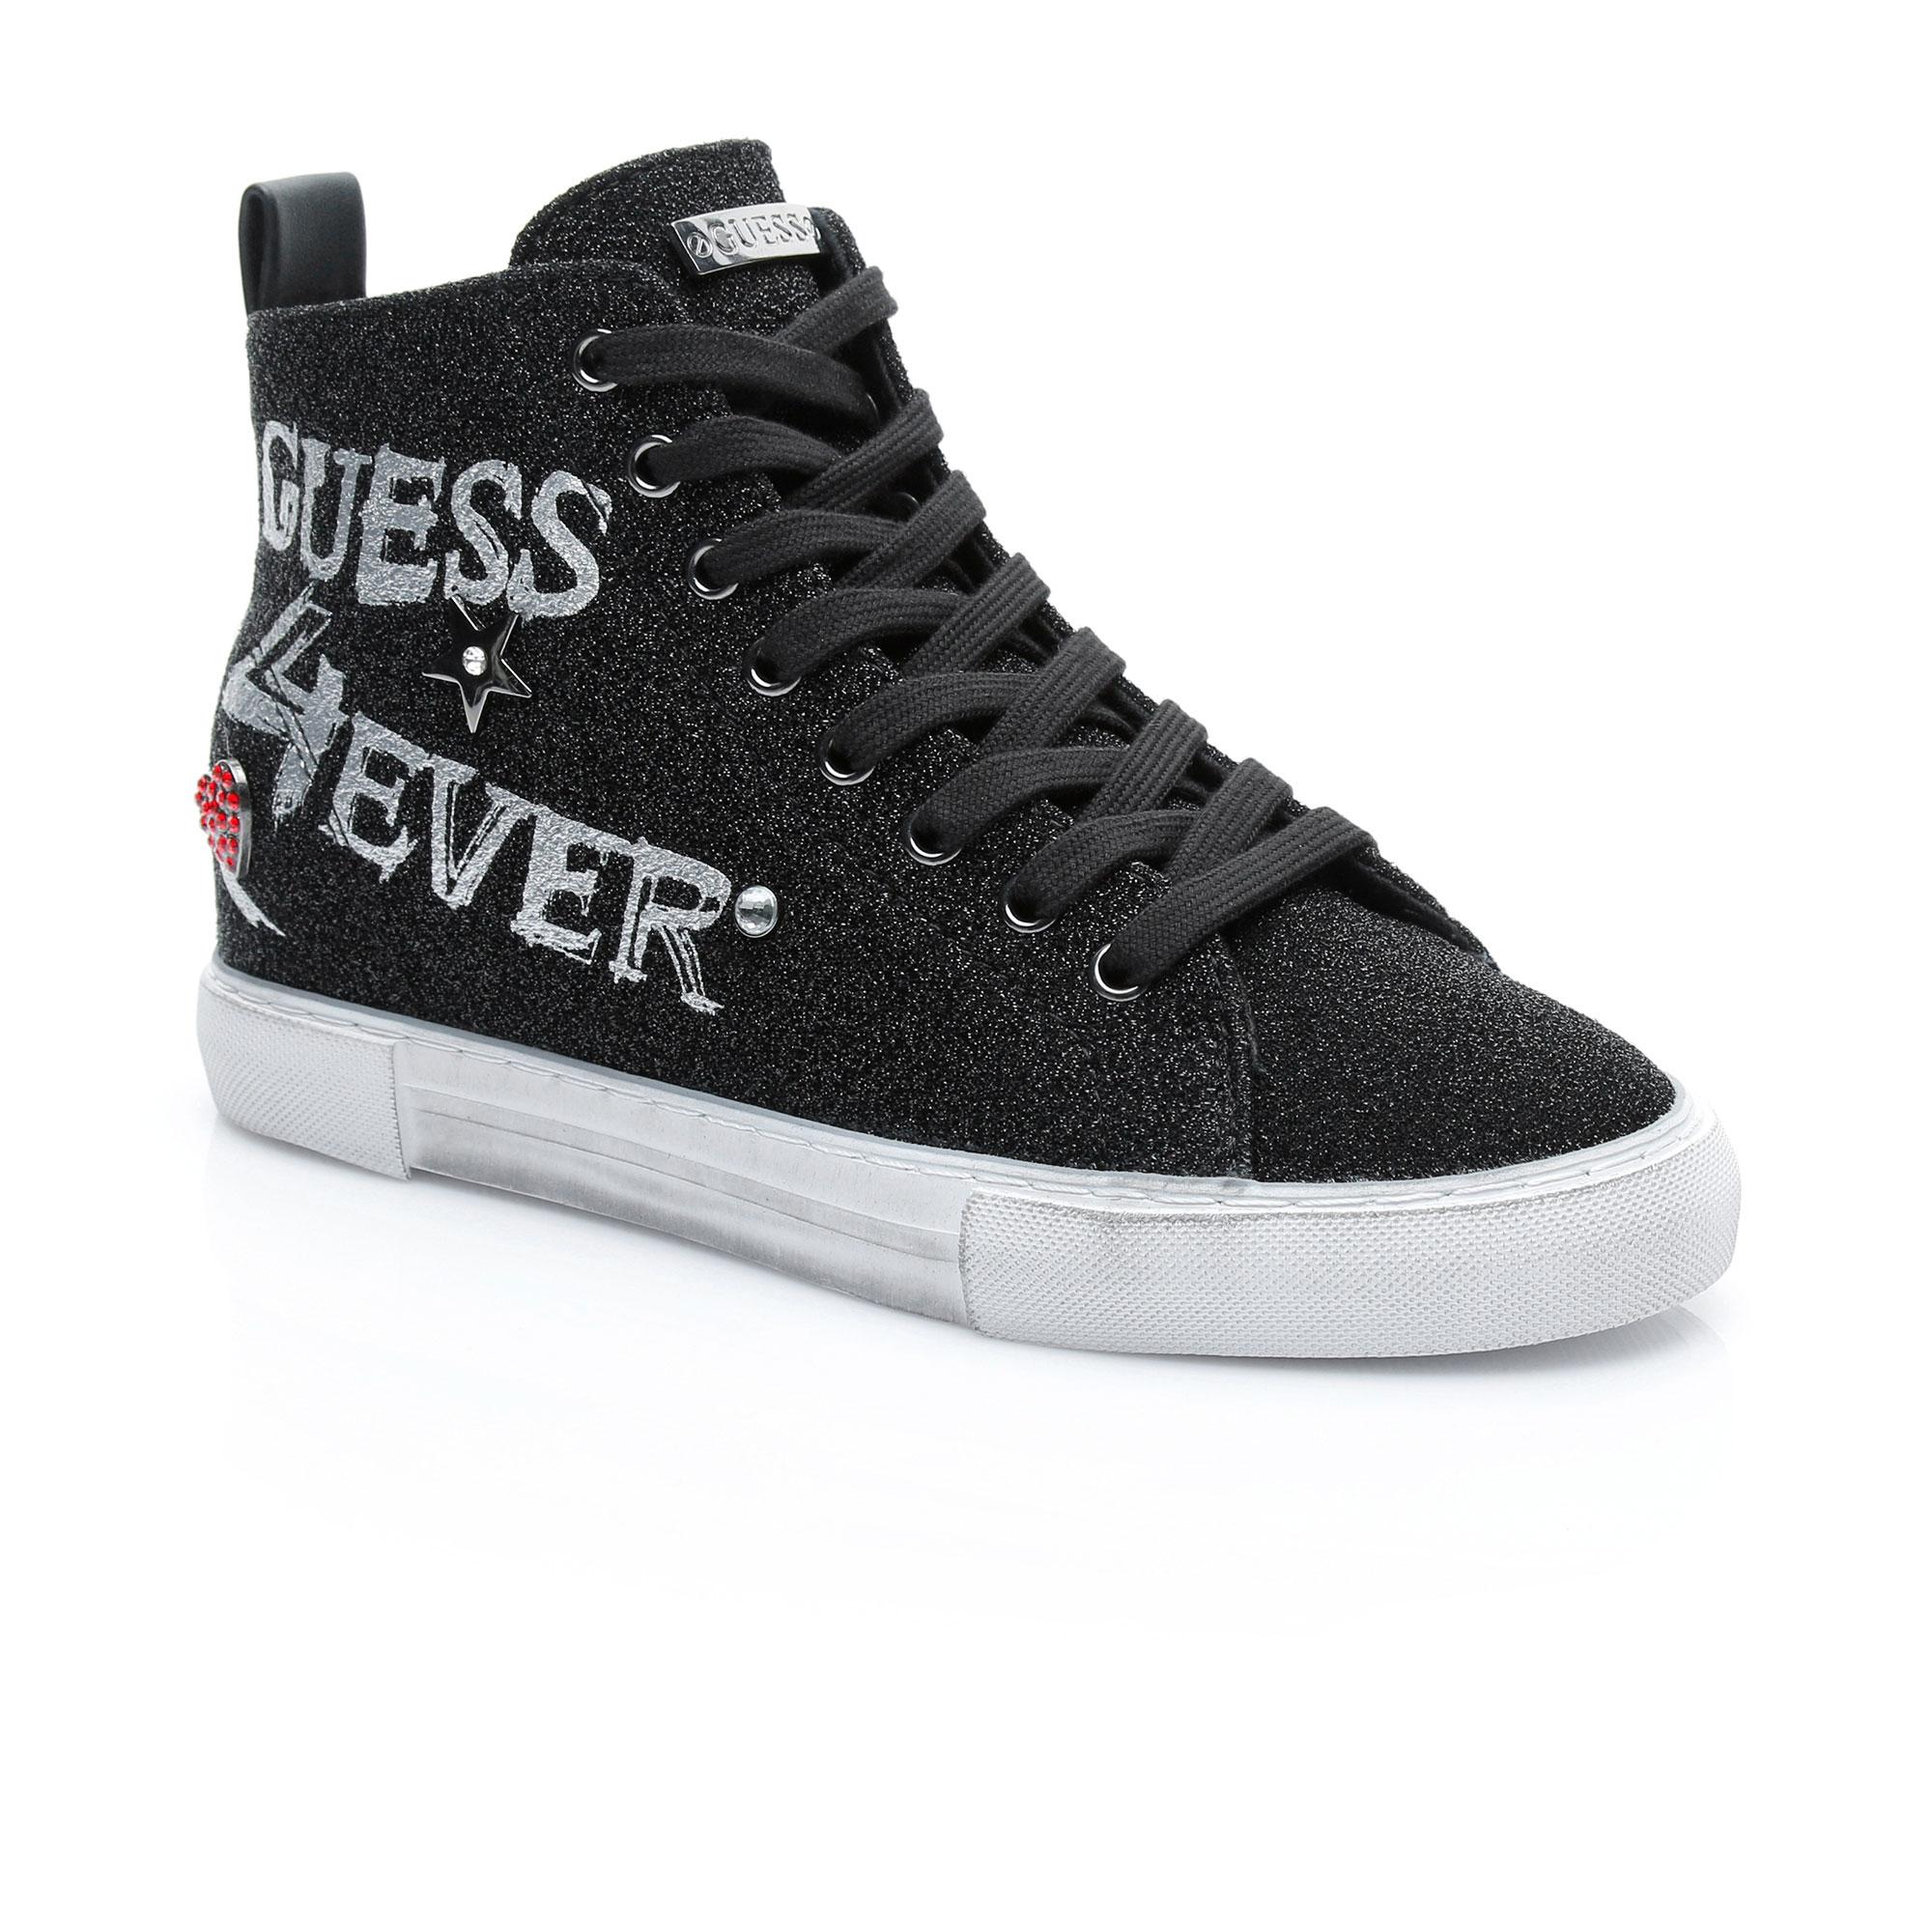 Guess Pyke Stıvaletto Kadın Siyah Sneaker